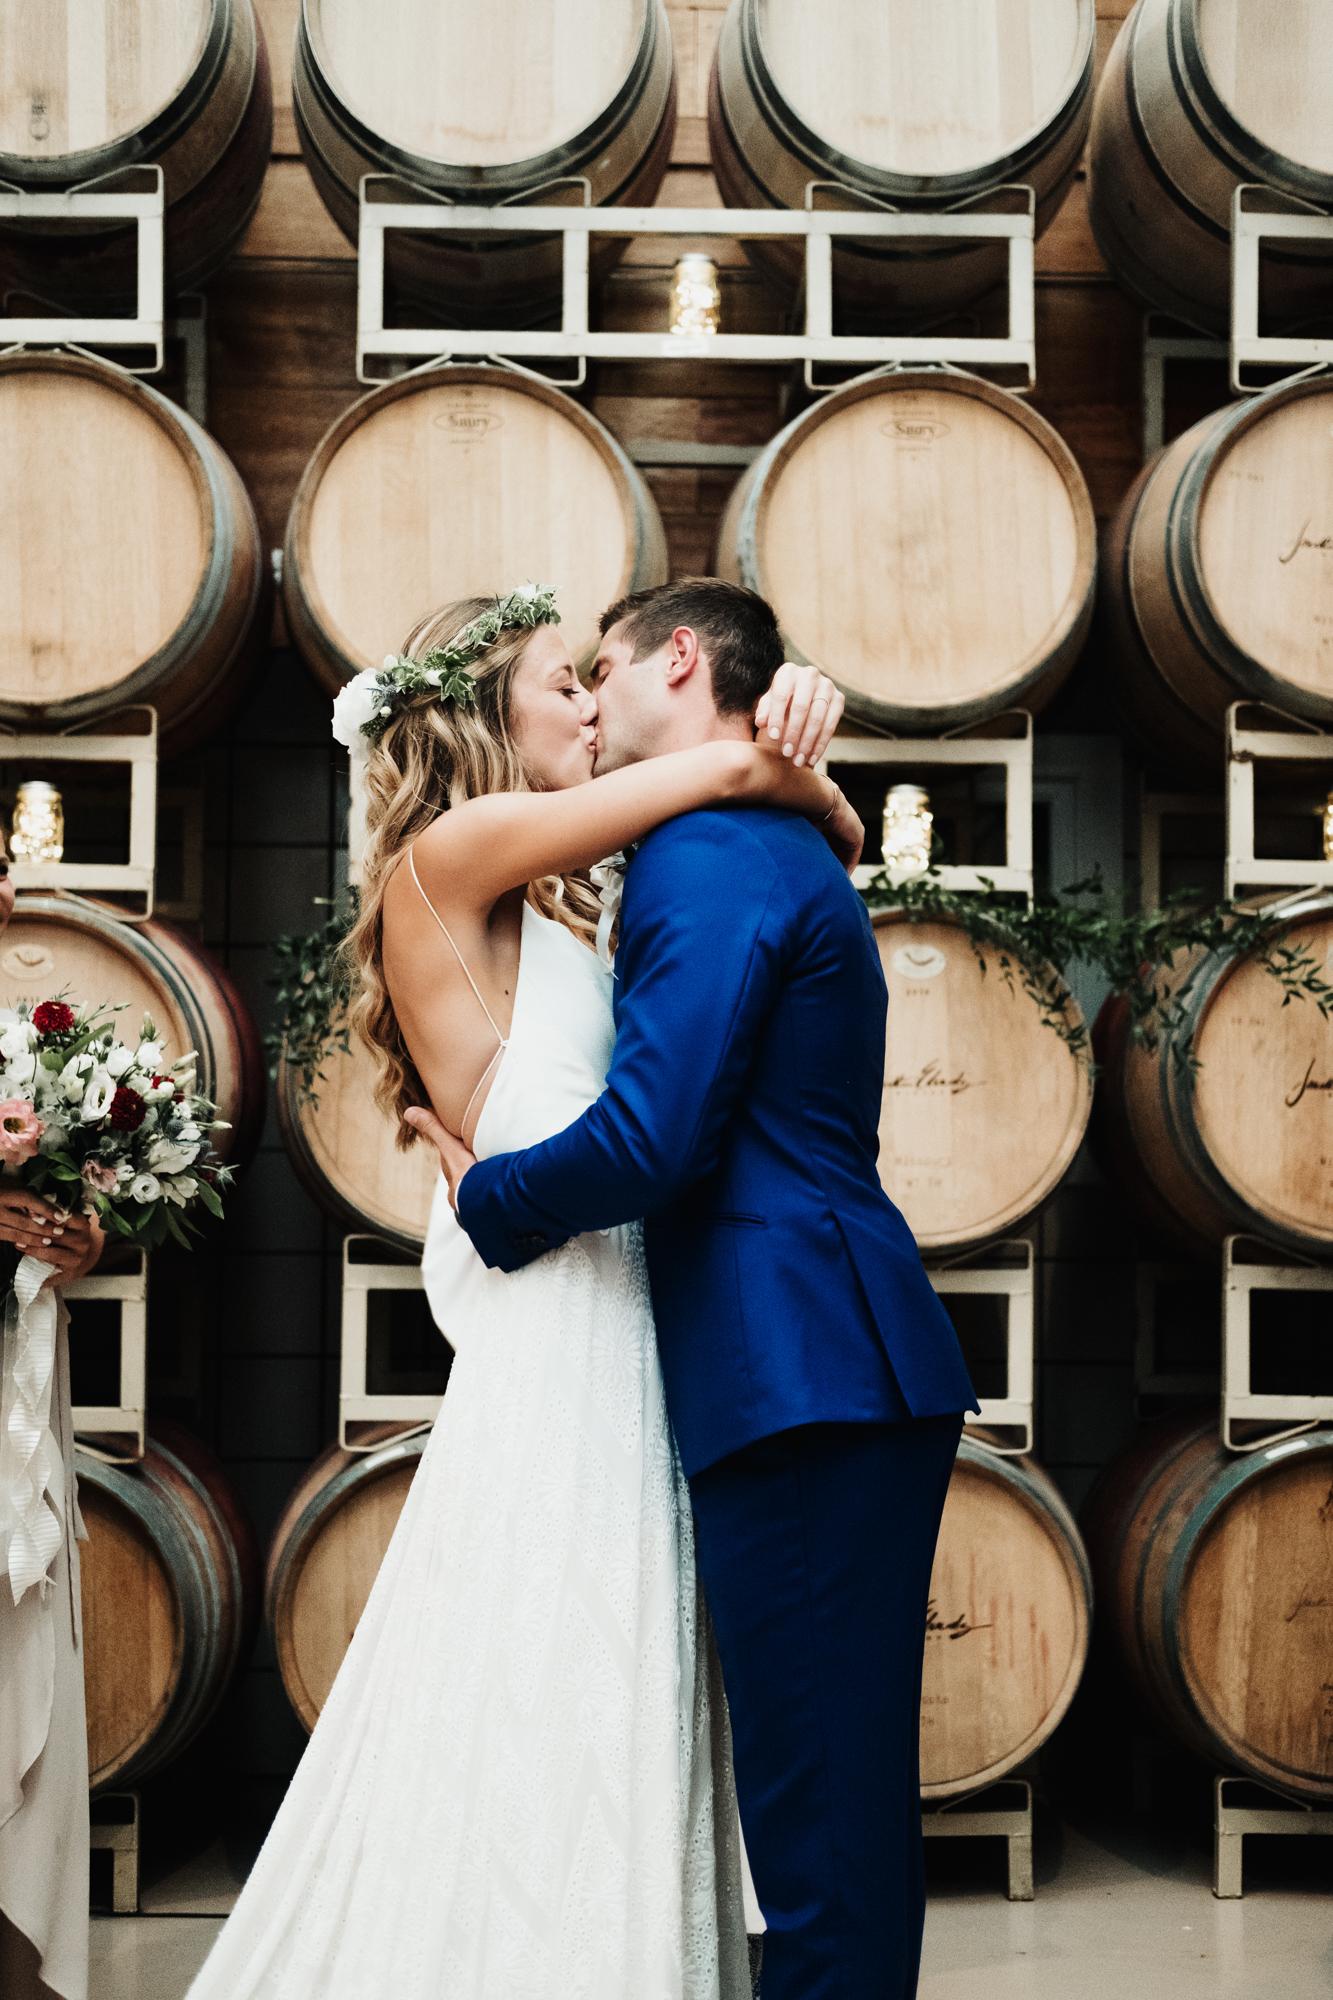 Wedding_Francis_Boucher_Jonathan_Edwards_Winery_2018-46.jpg